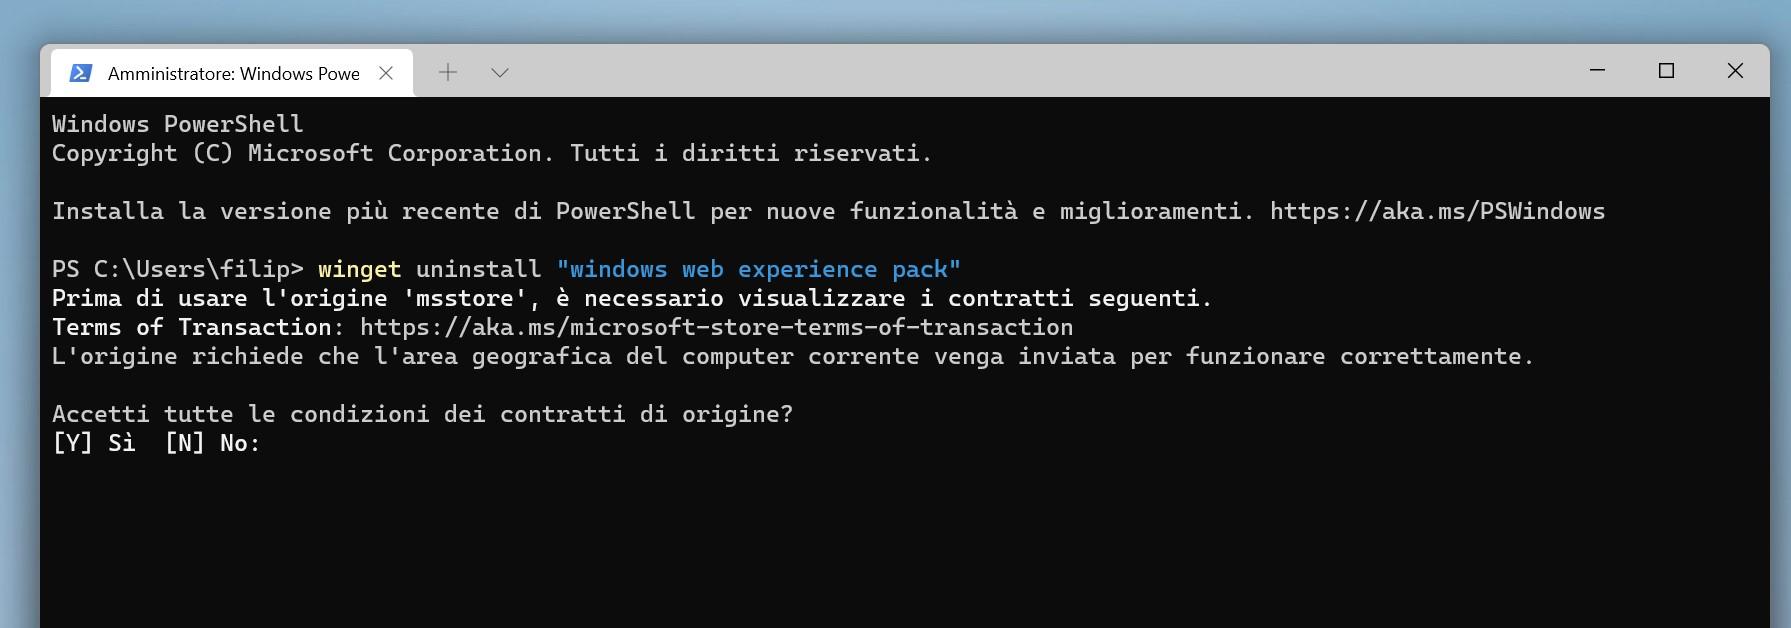 Windows Terminal - Disinstallazione Windows Web Experience Pack - Widgets